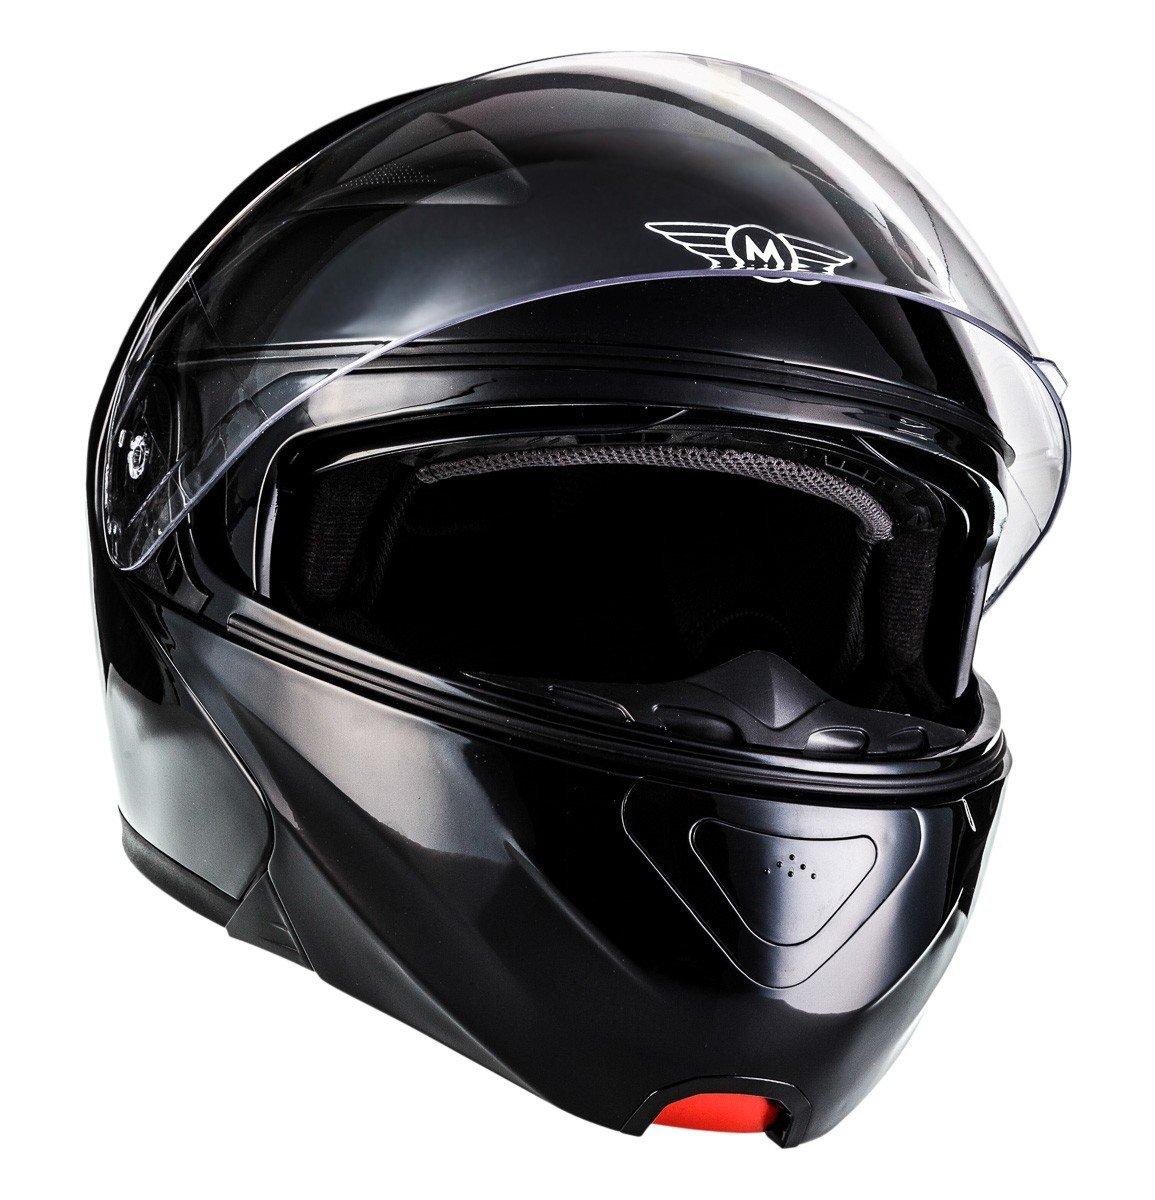 MOTO F19 Matt White · Cruiser Integral-Helm Sturz-Helm Scooter-Helm Modular-Helm Flip-Up-Helm Helmet Klapp-Helm Motorrad-Helm Roller-Helm · ECE zertifiziert · zwei Visiere · inkl. Stofftragetasche · Weiß · M